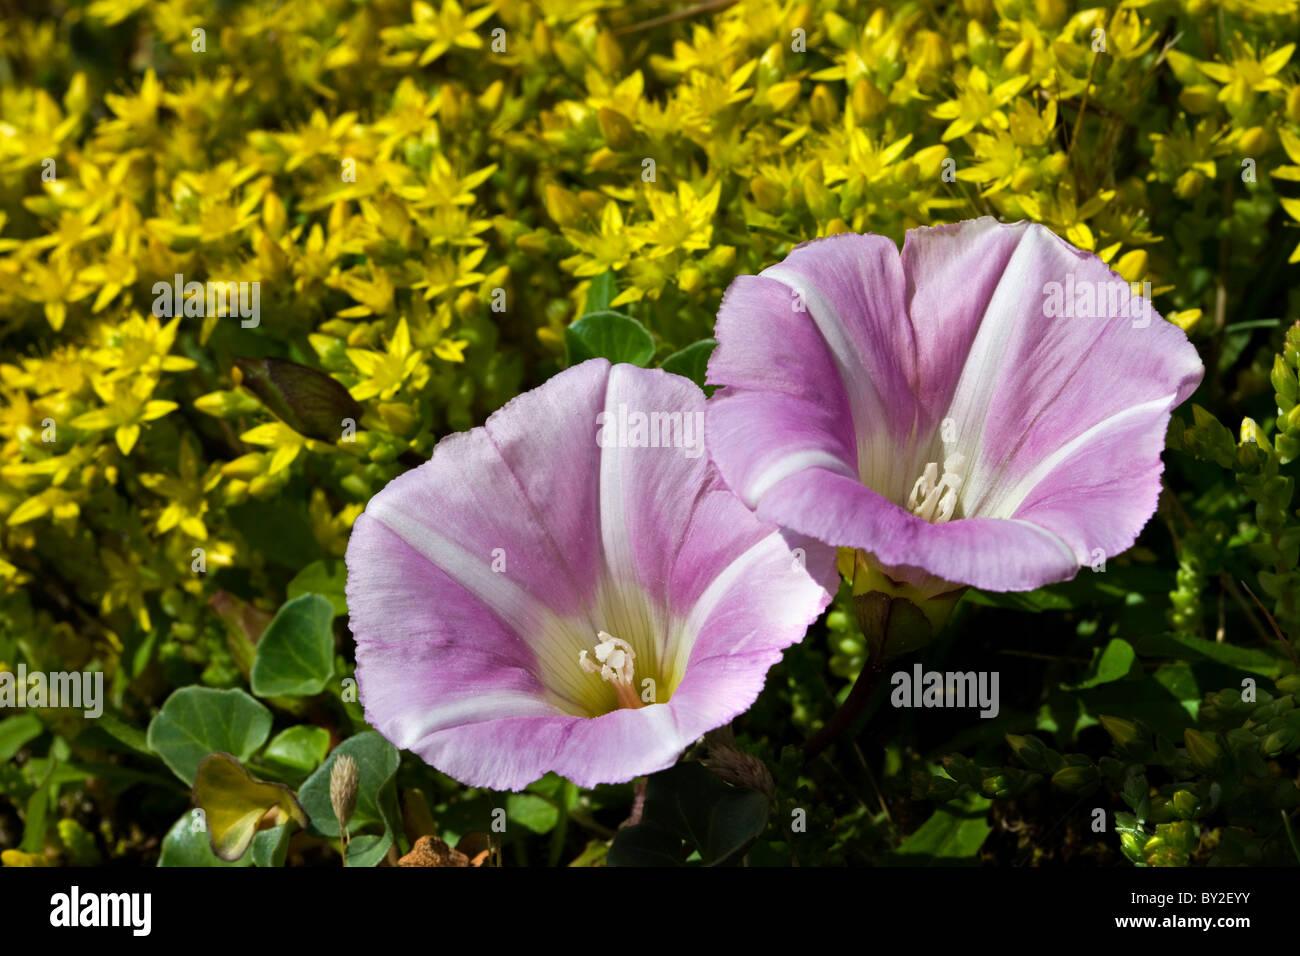 Morning glory (Convolvulus soldanella / Calystegia soldanella) and Biting Stonecrop / Wallpepper (Sedum acre) - Stock Image